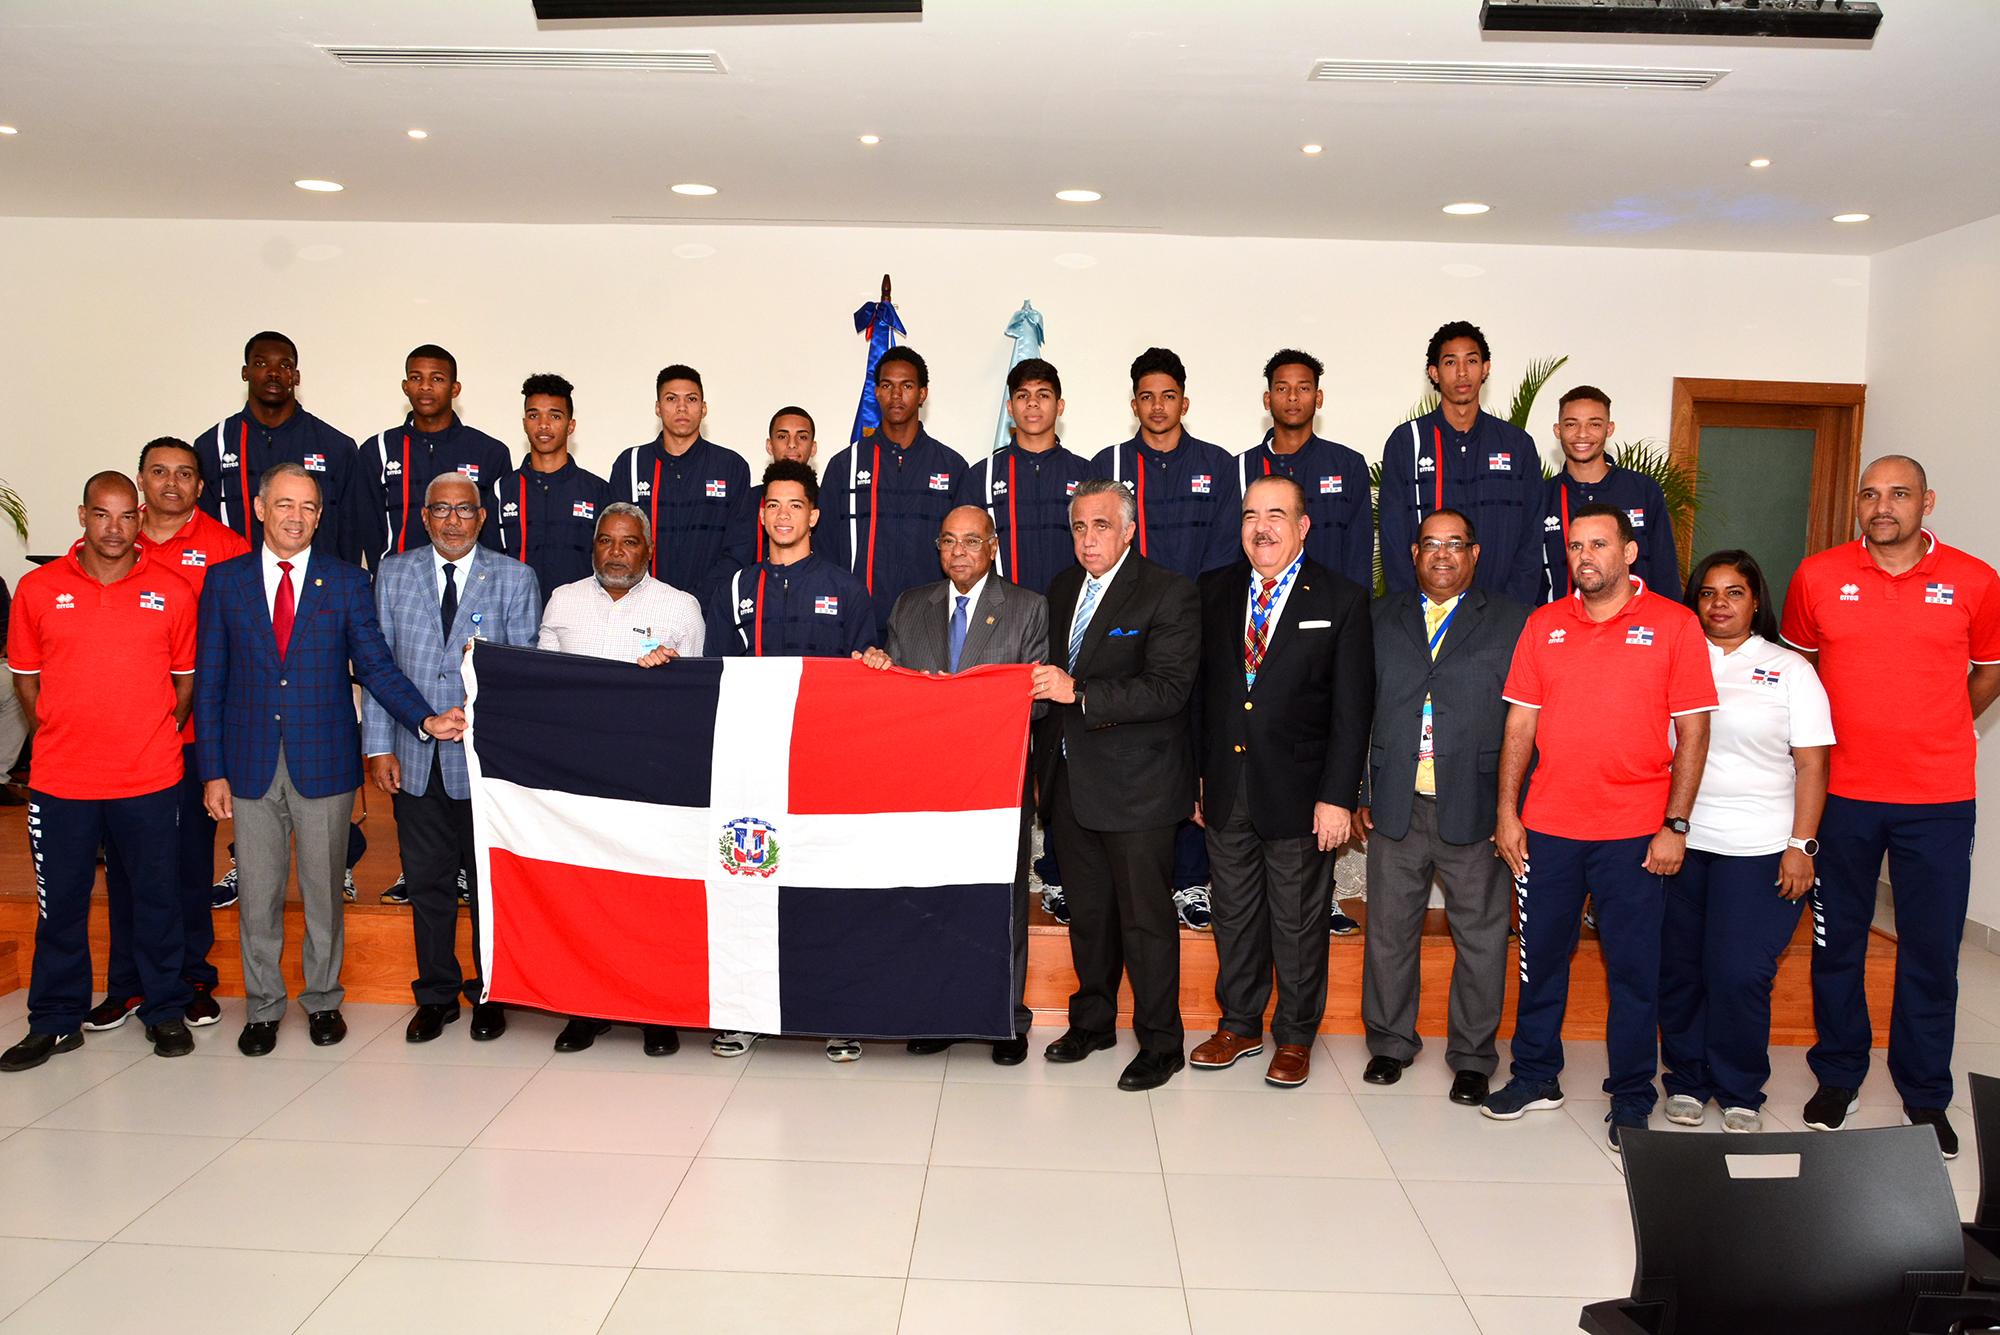 RD contra Guatemala en la Copa Panamericana de Voleibol